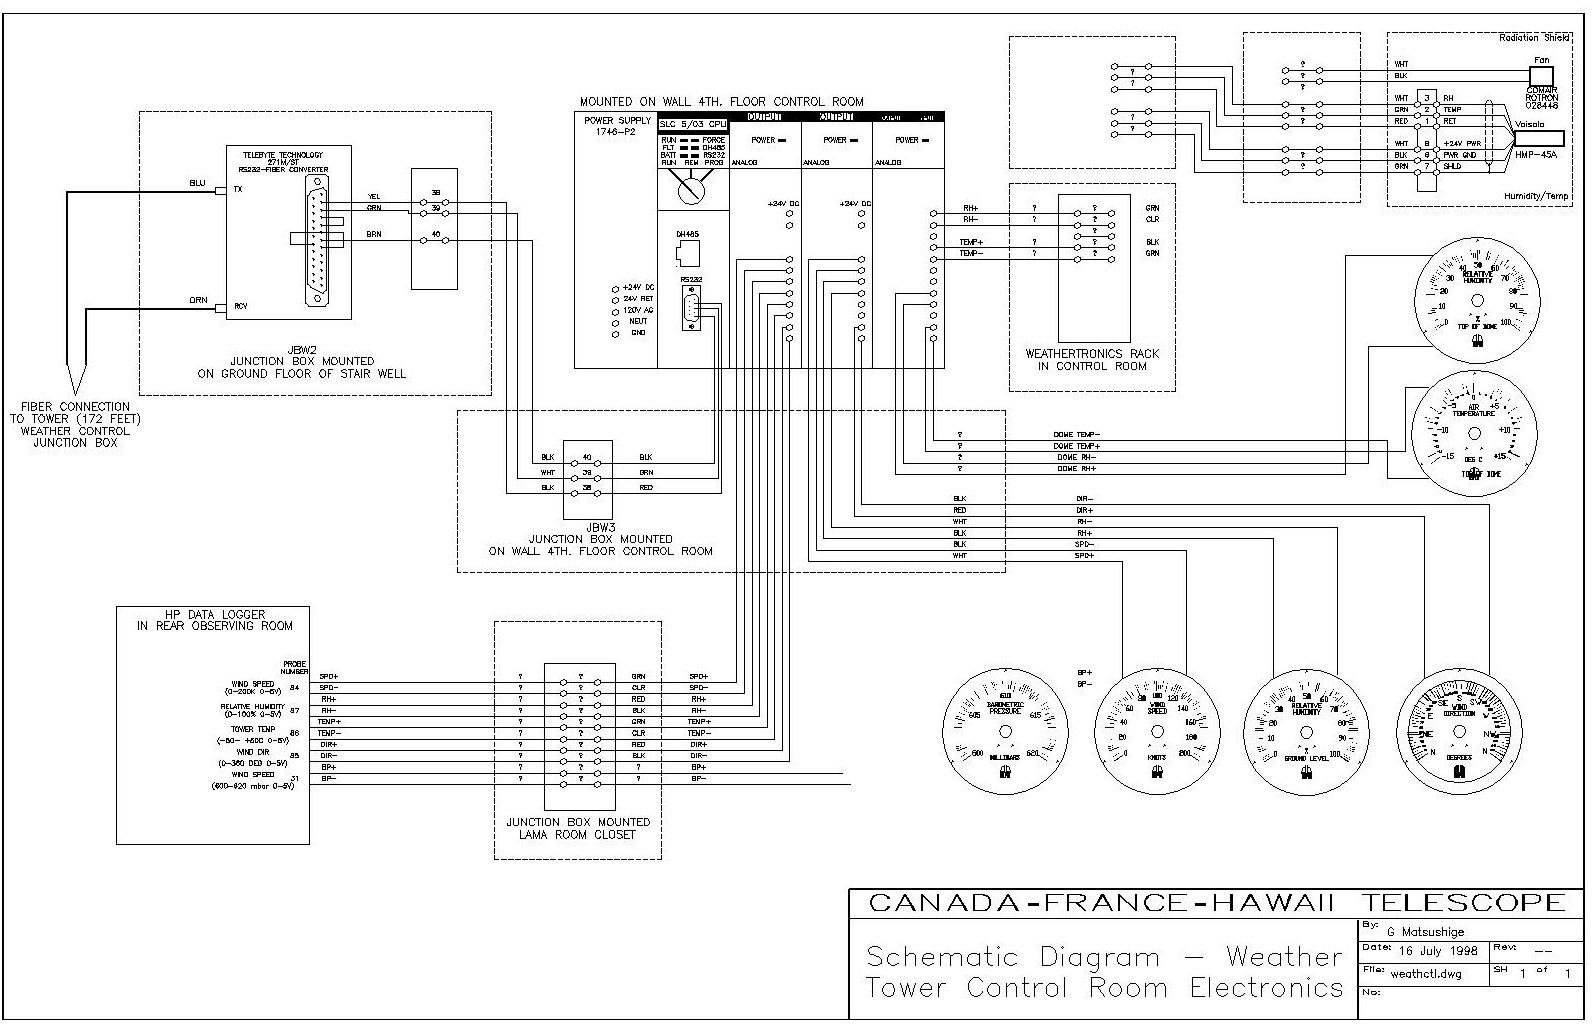 allen bradley 509 aod wiring diagram Download-pf 40 3 wire snk control reversing on allen bradley motor wiring rh natebird me Motor Starter Overload Wiring Diagrams Typical Motor Wiring Diagrams 5-r